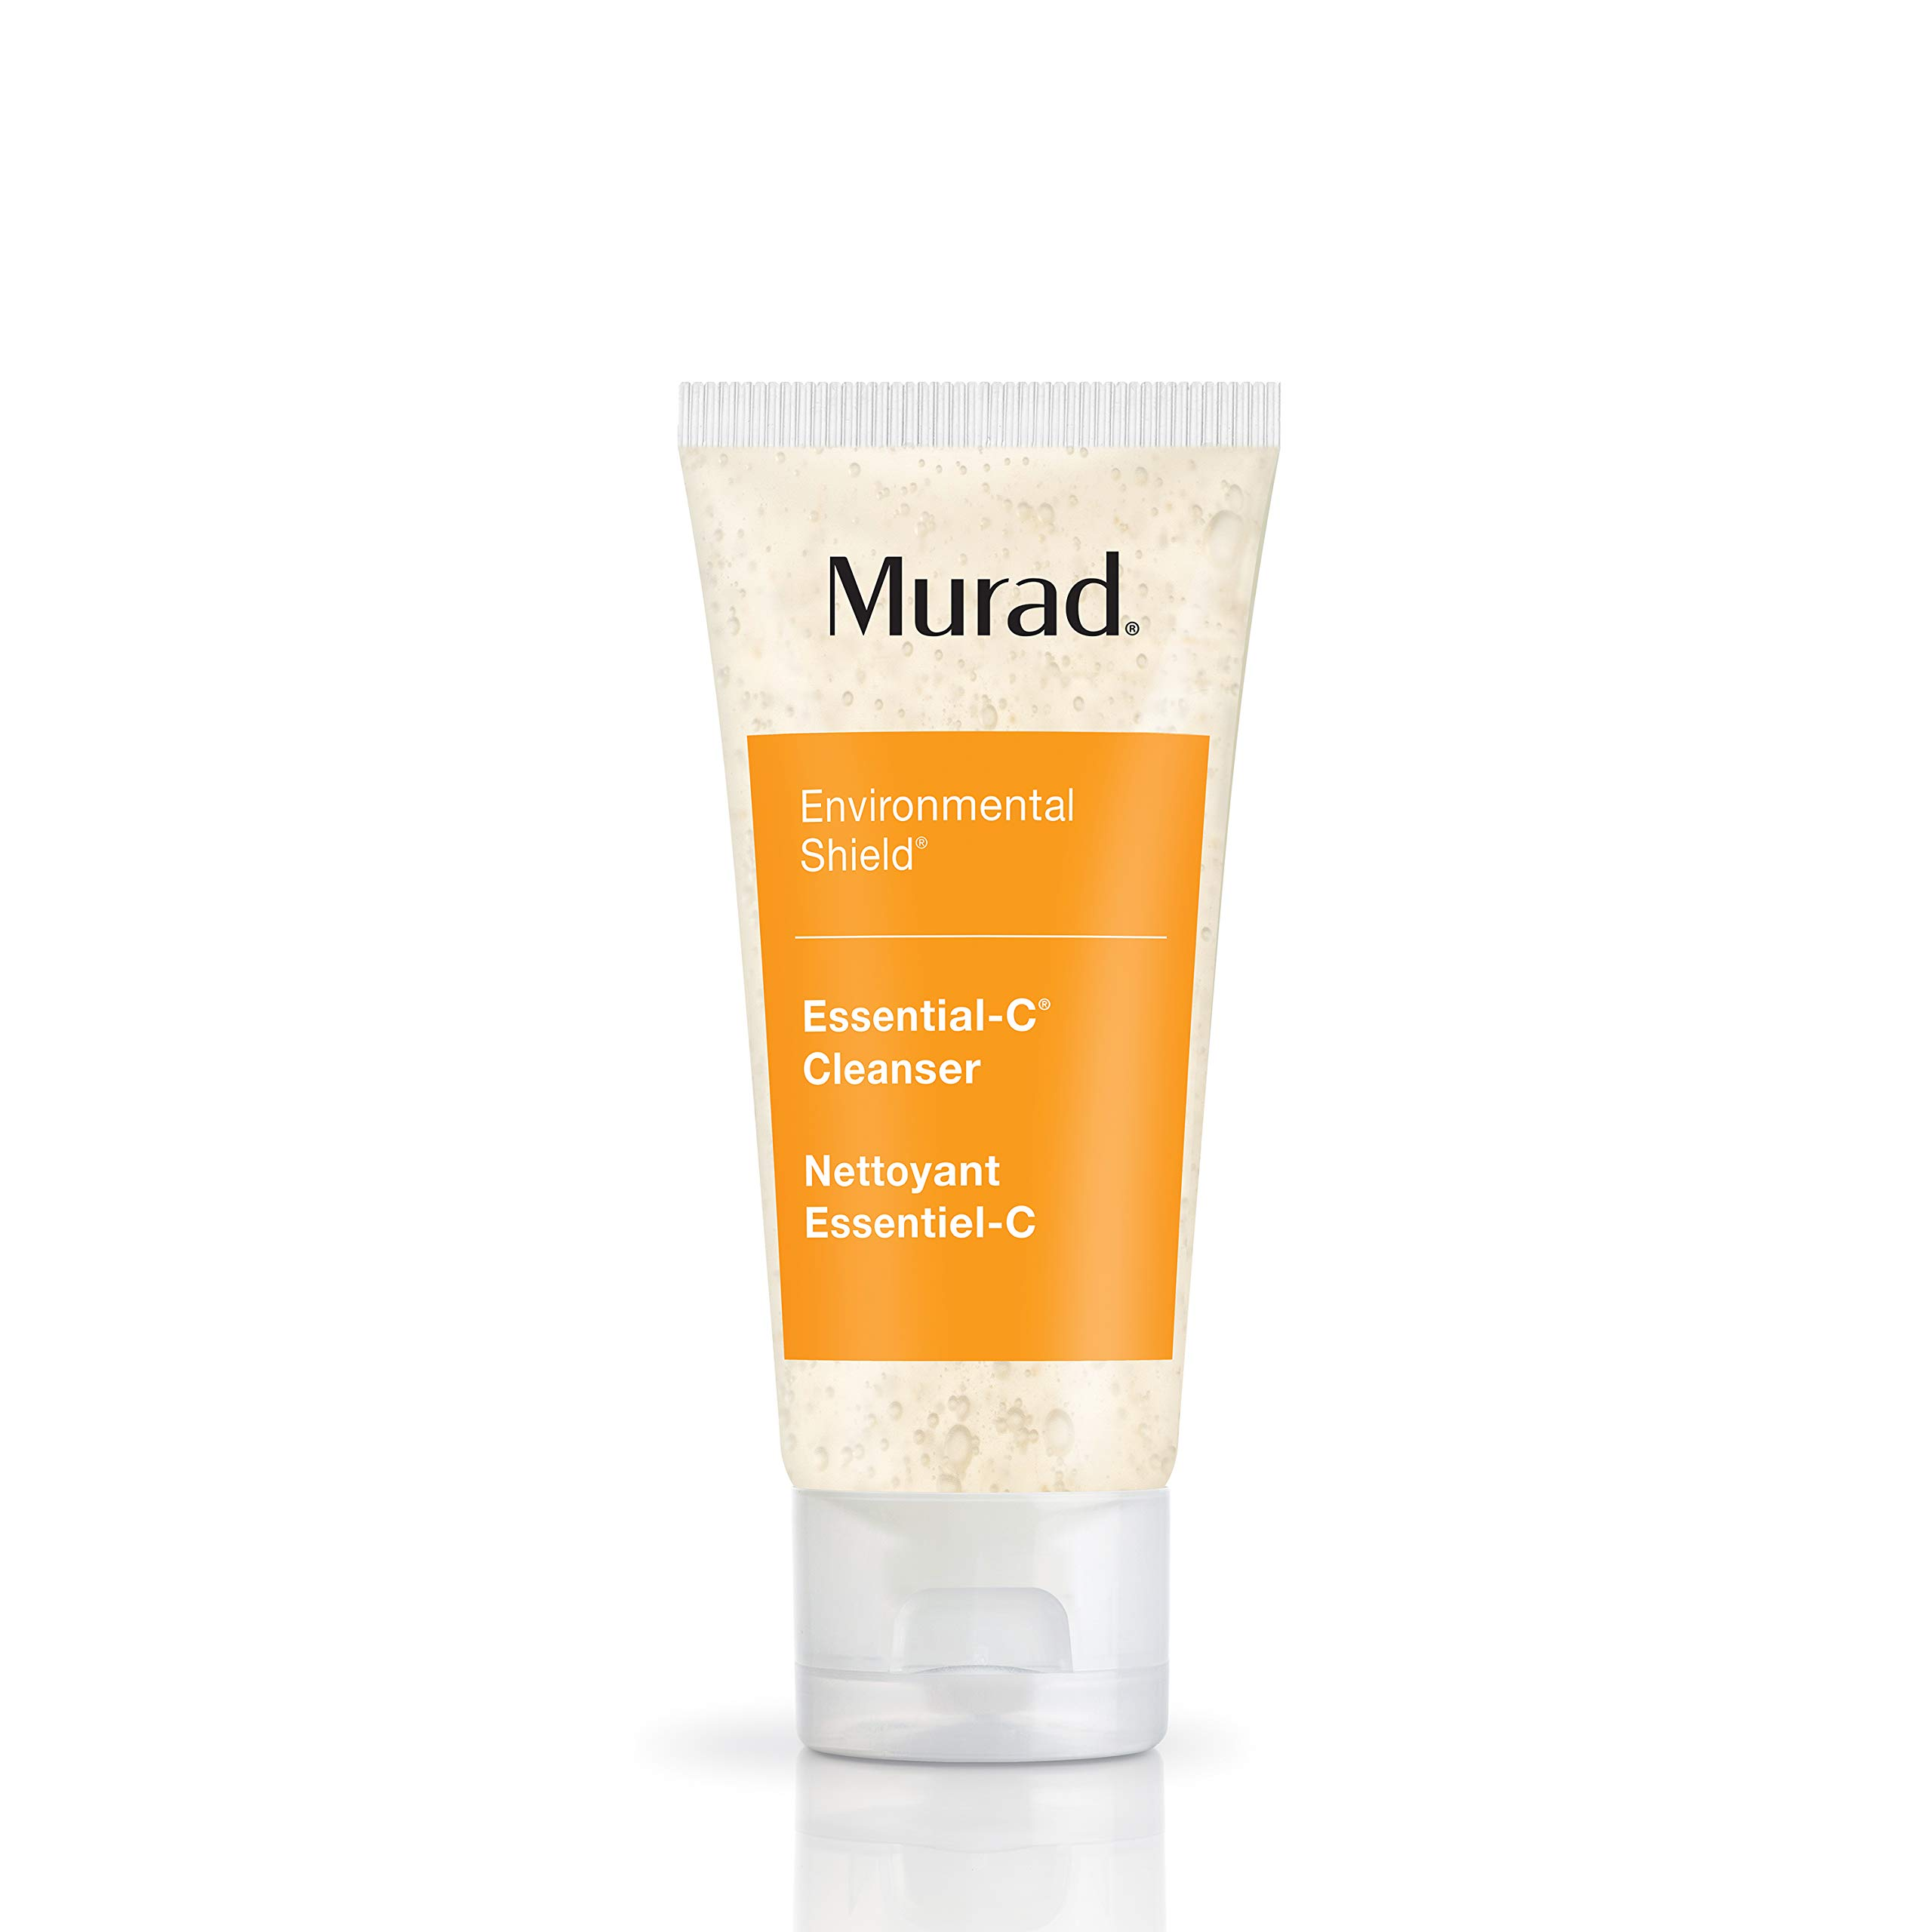 Murad Essential-c Cleanser, 2.0 Ounce / 60 ml